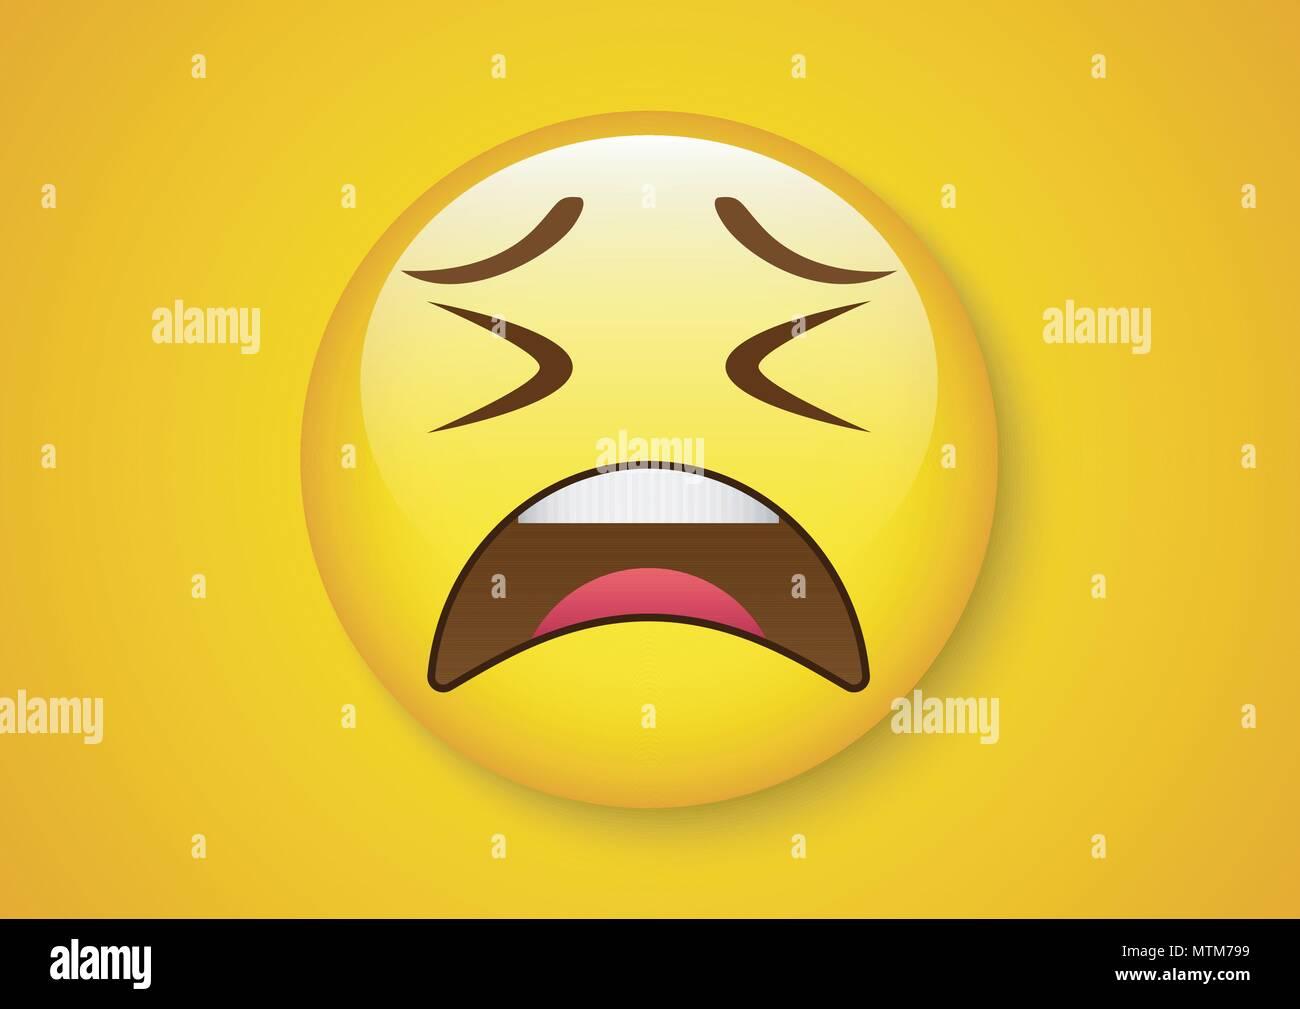 Smiley Tired Emoticon Yellow Face Stock Photos & Smiley Tired